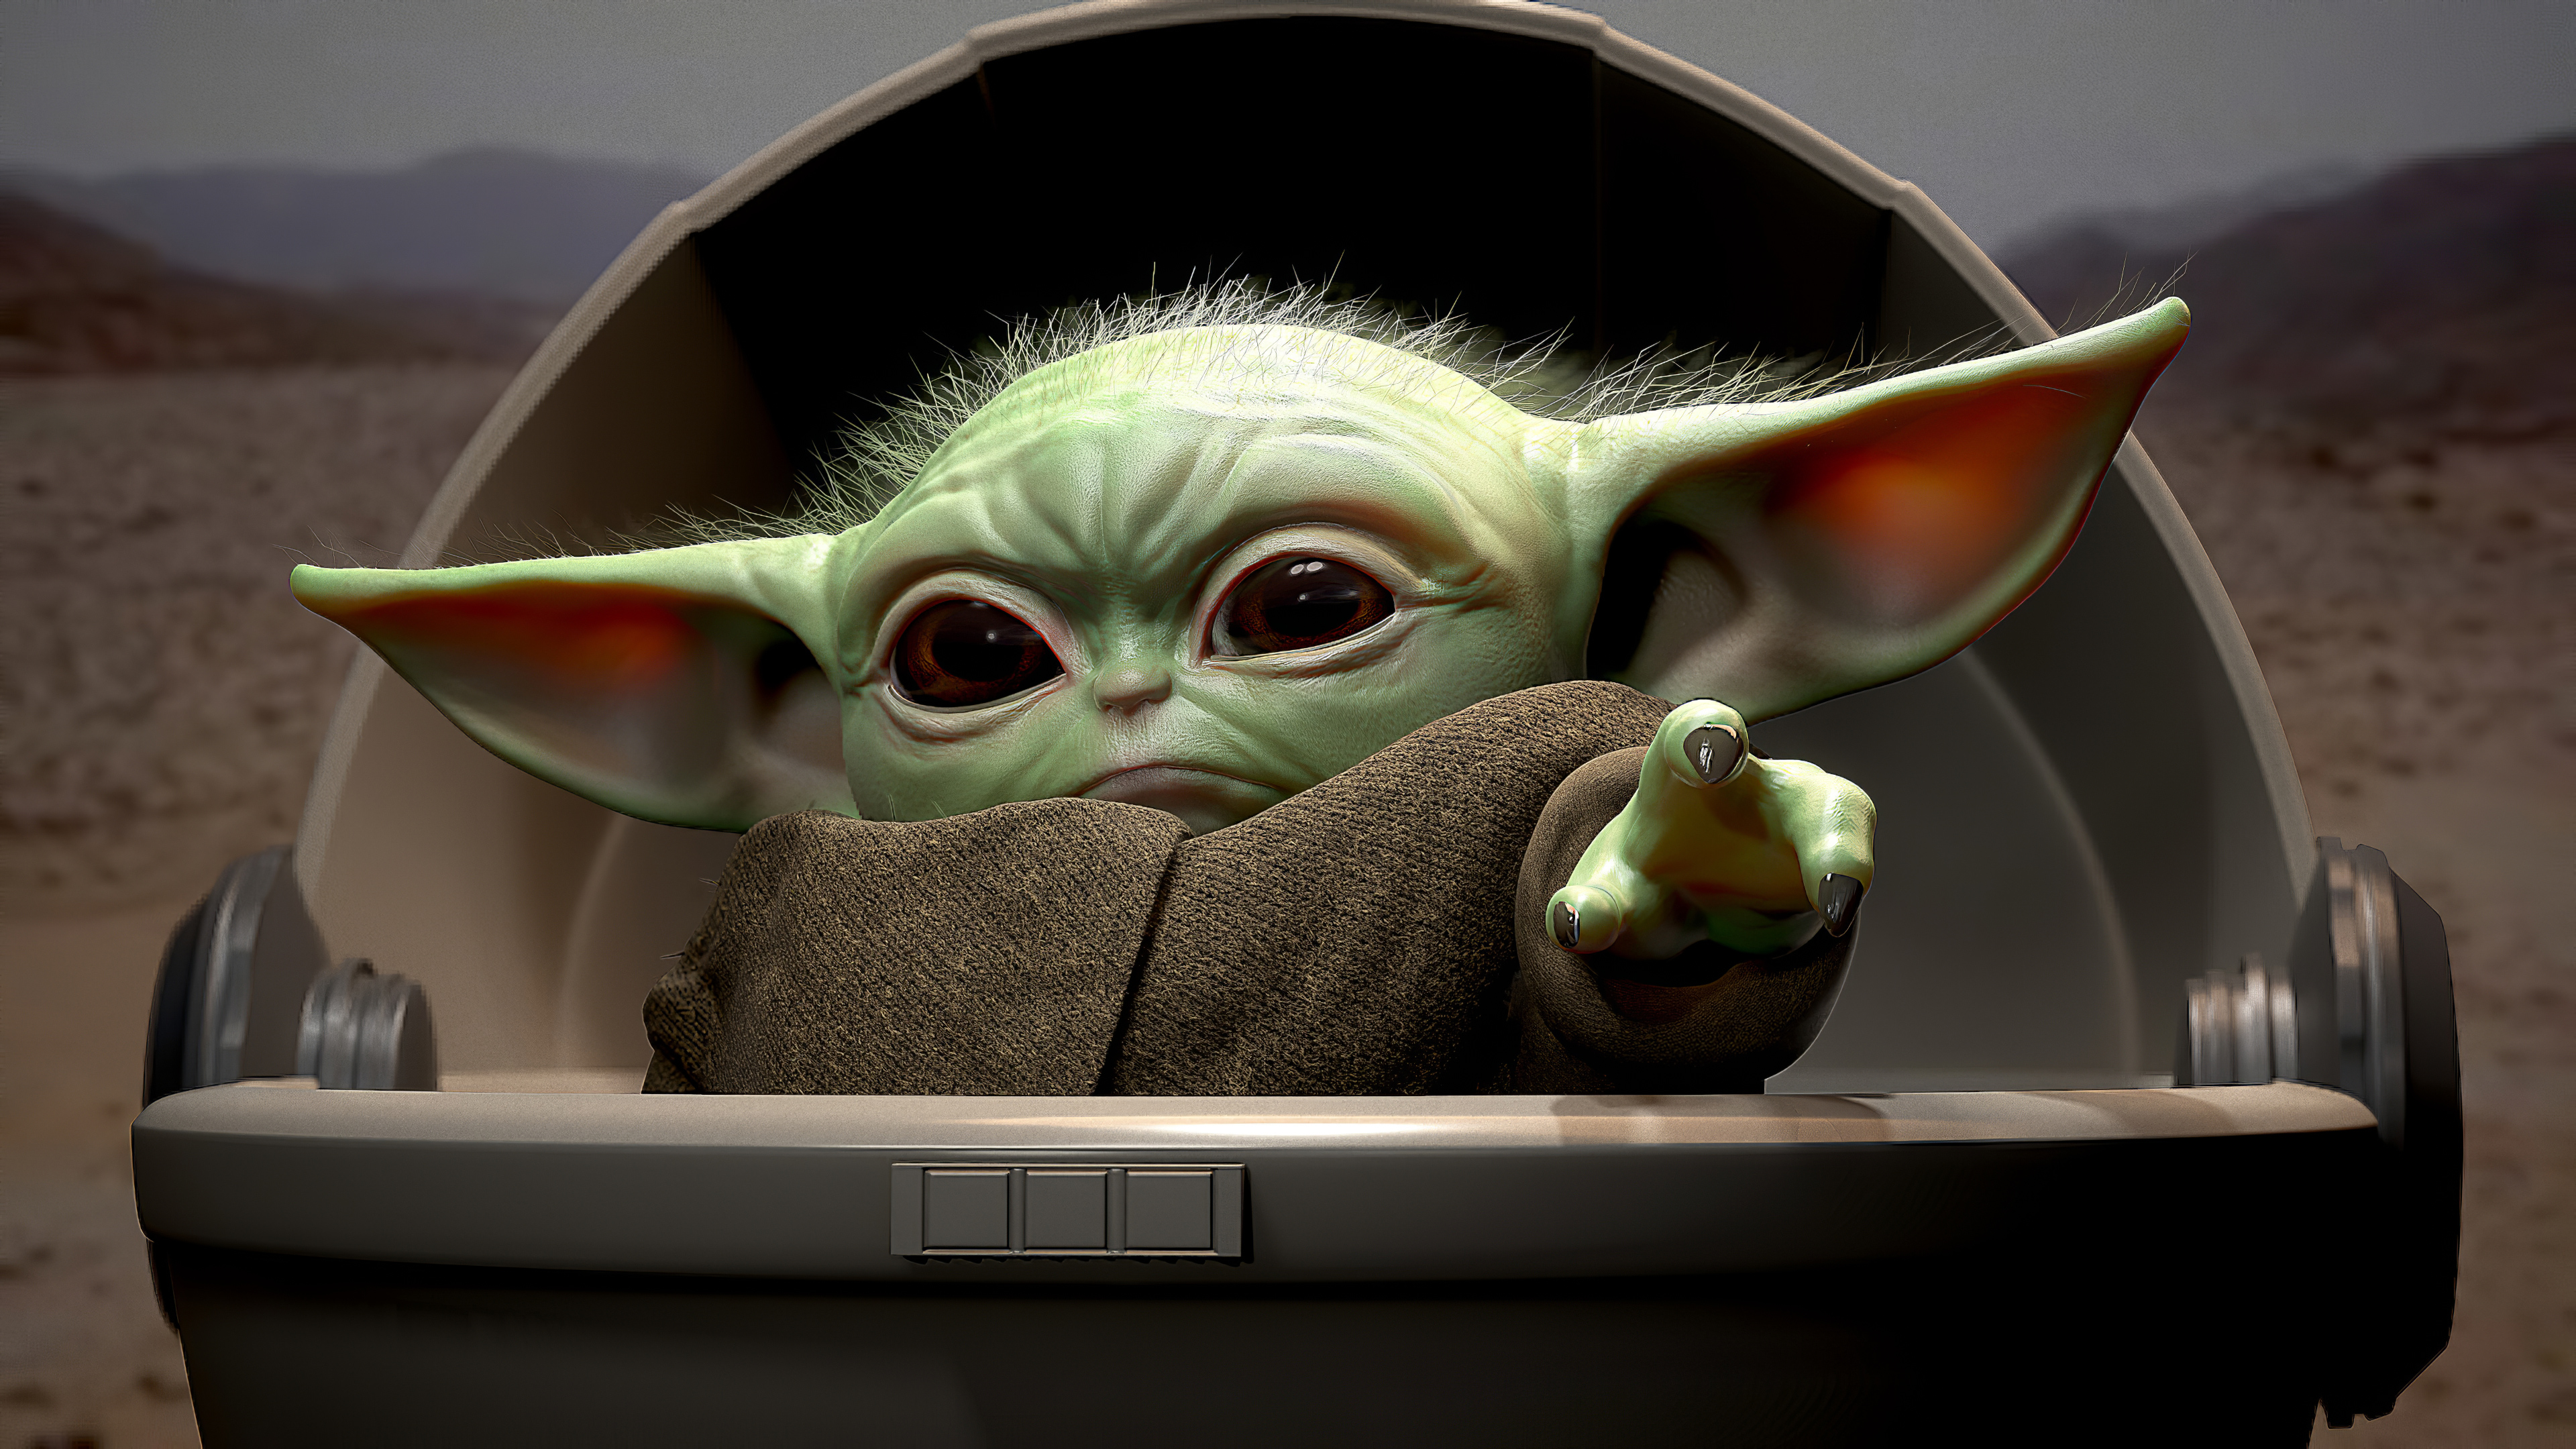 baby yoda 1581621951 - Baby Yoda - Baby Yoda wallpapers, Baby Yoda phone wallpapers 4k, Baby Yoda 4k wallpapers